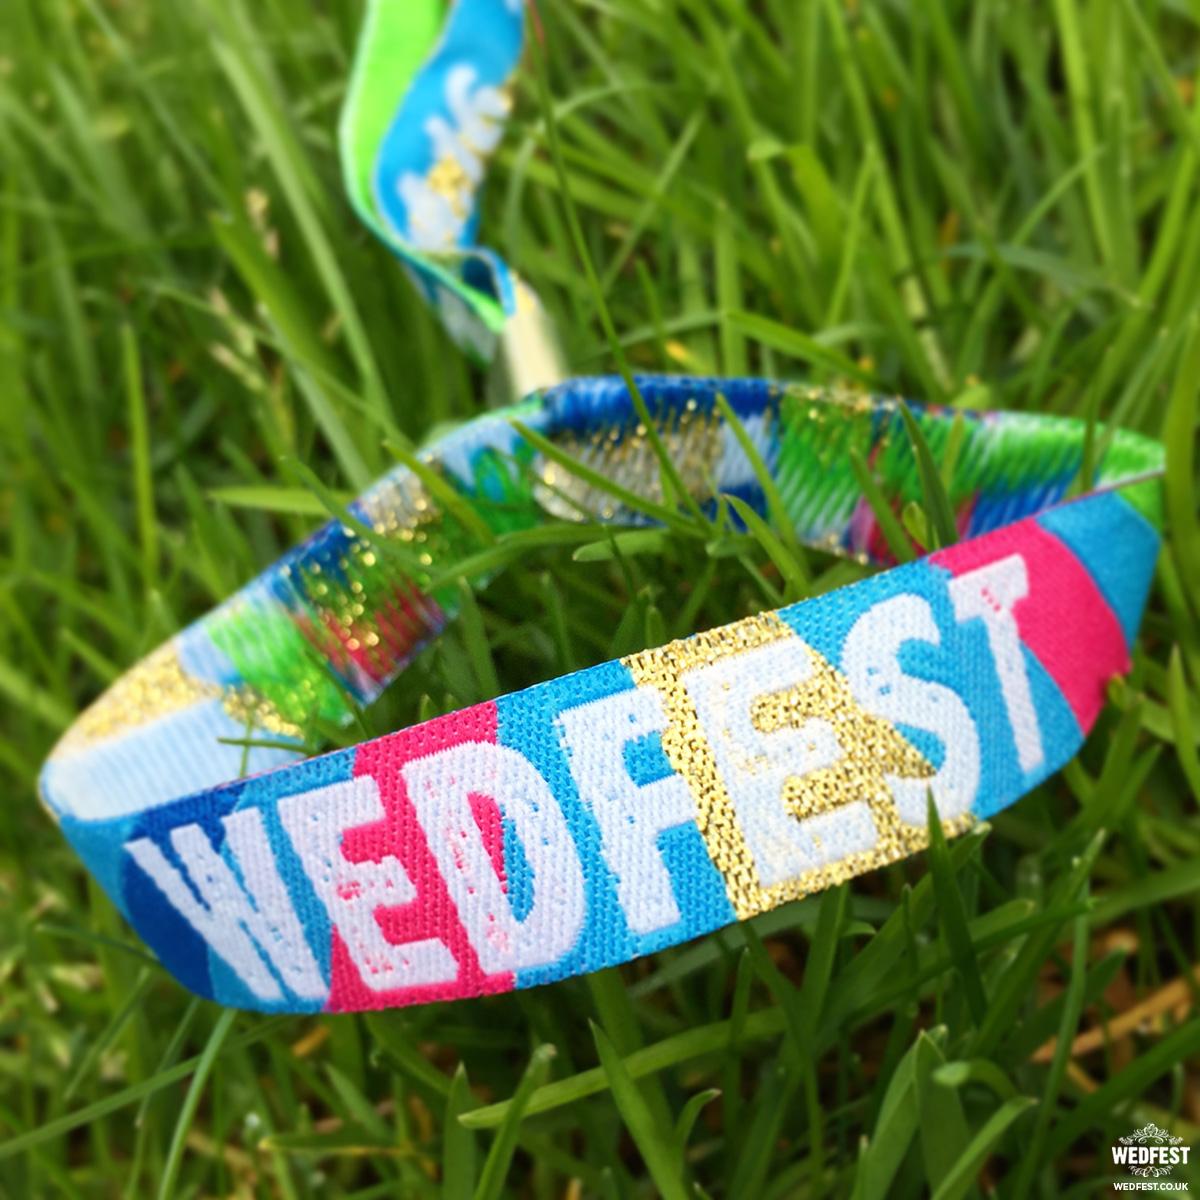 wedfest festival wedding wristbands